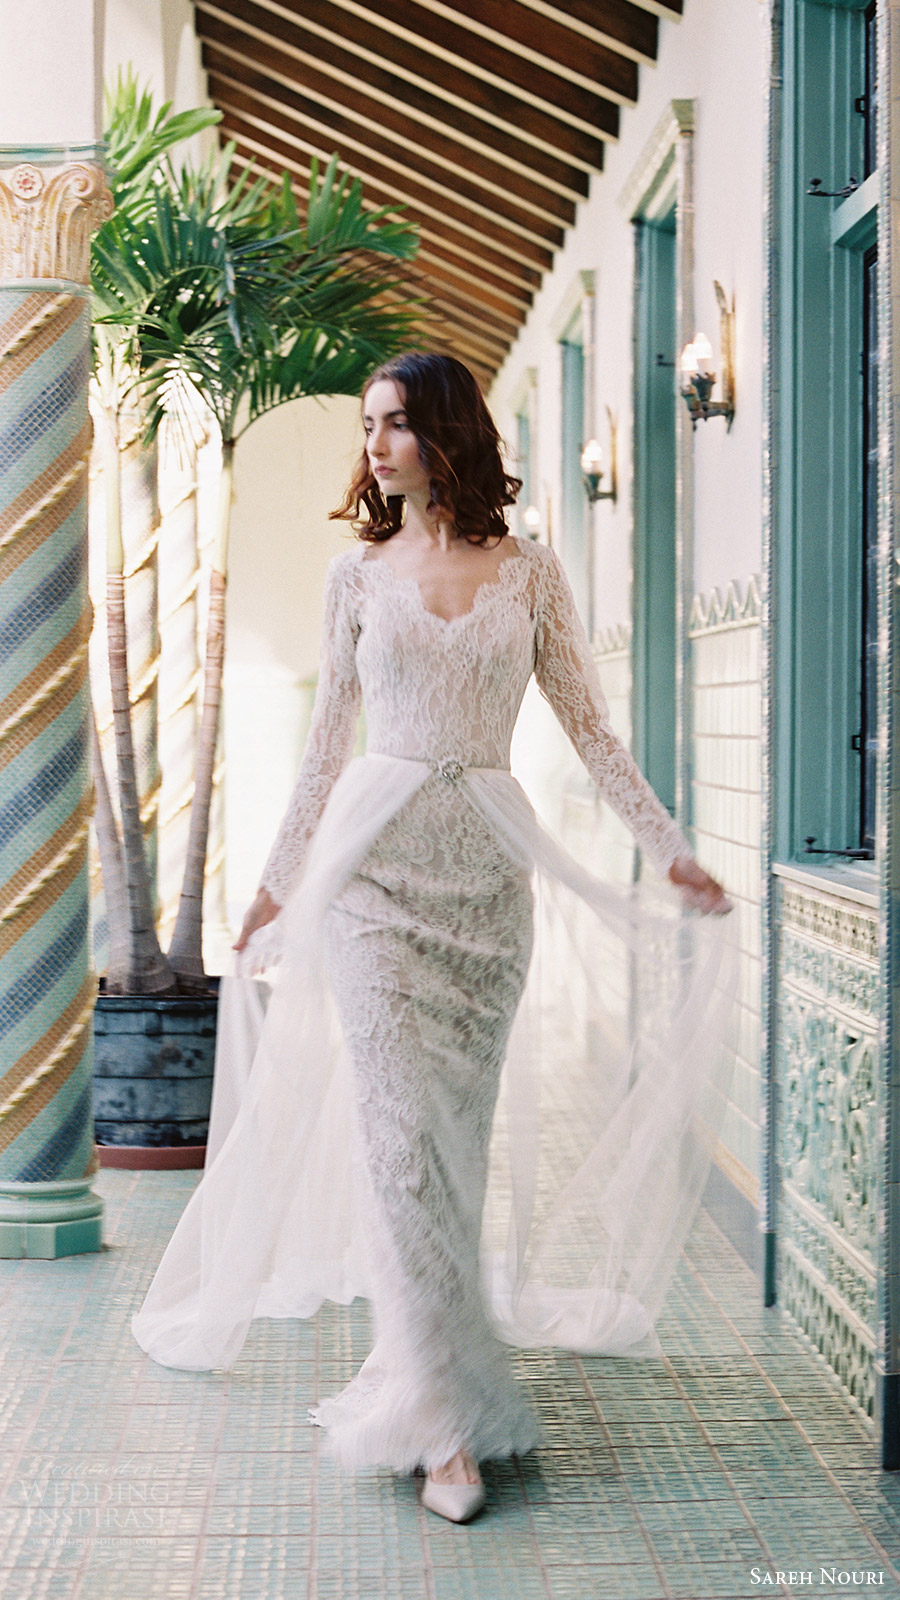 Sareh nouri bridal spring 2017 wedding dresses wedding for How to dress for a morning wedding